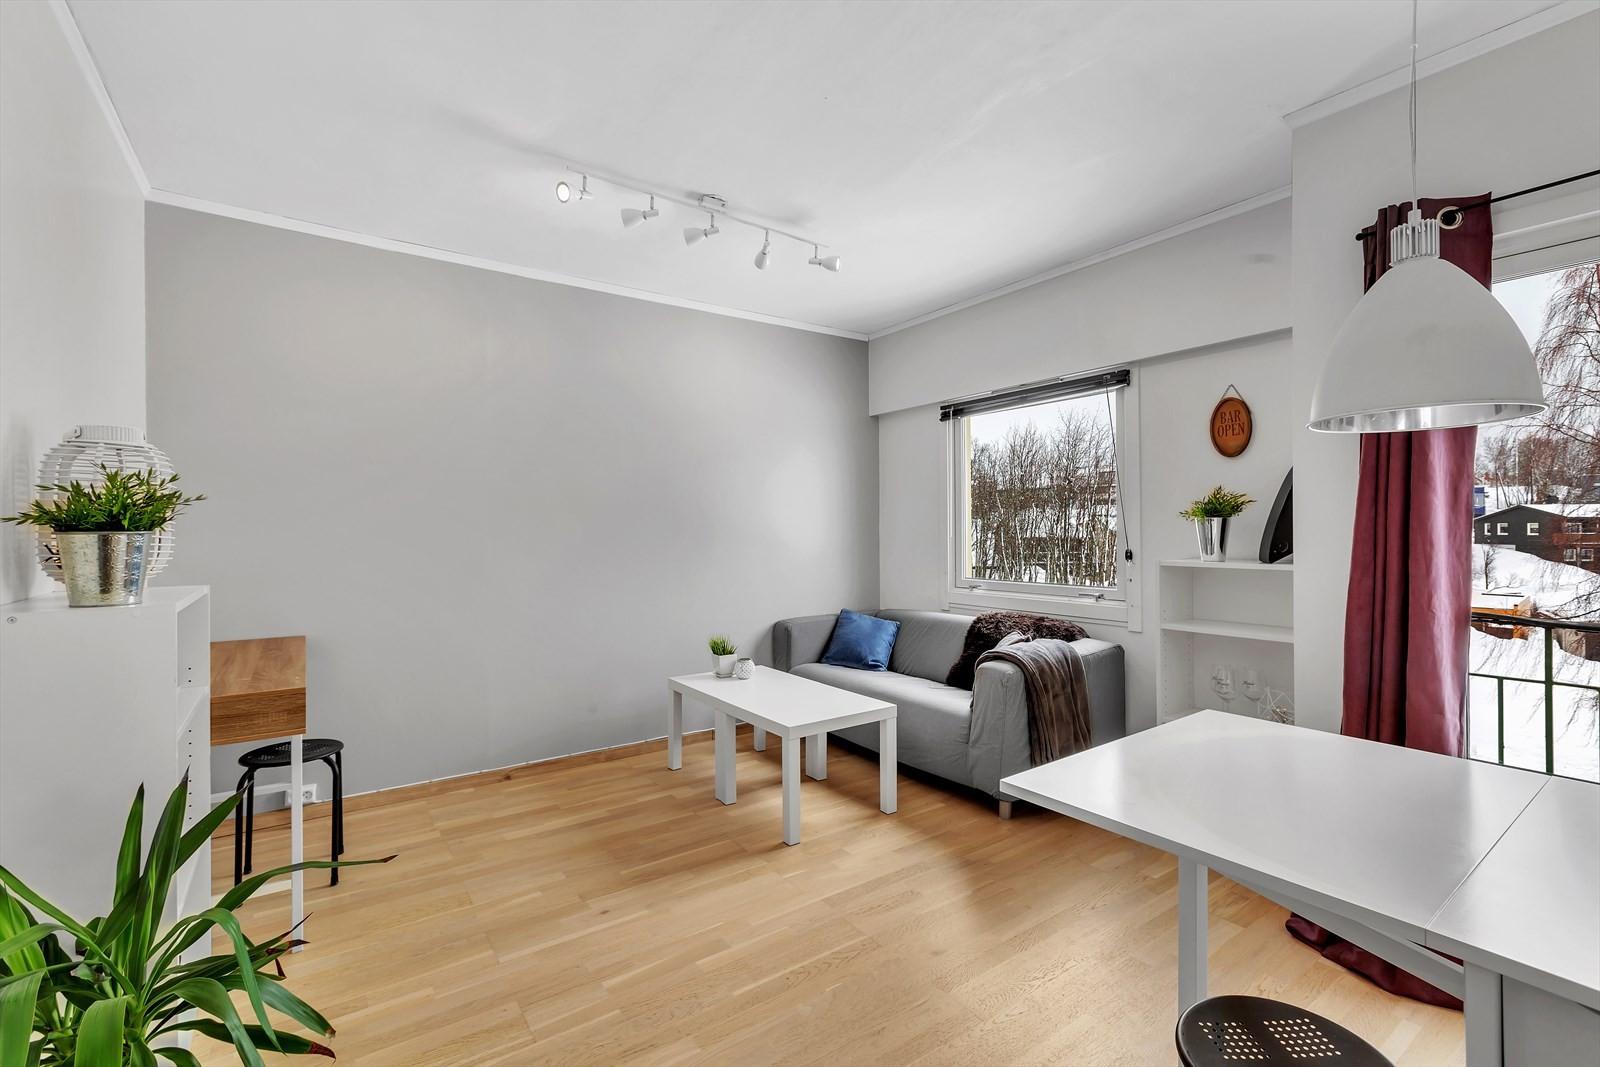 Lys og trivelig stue med flere møbleringsmuligheter